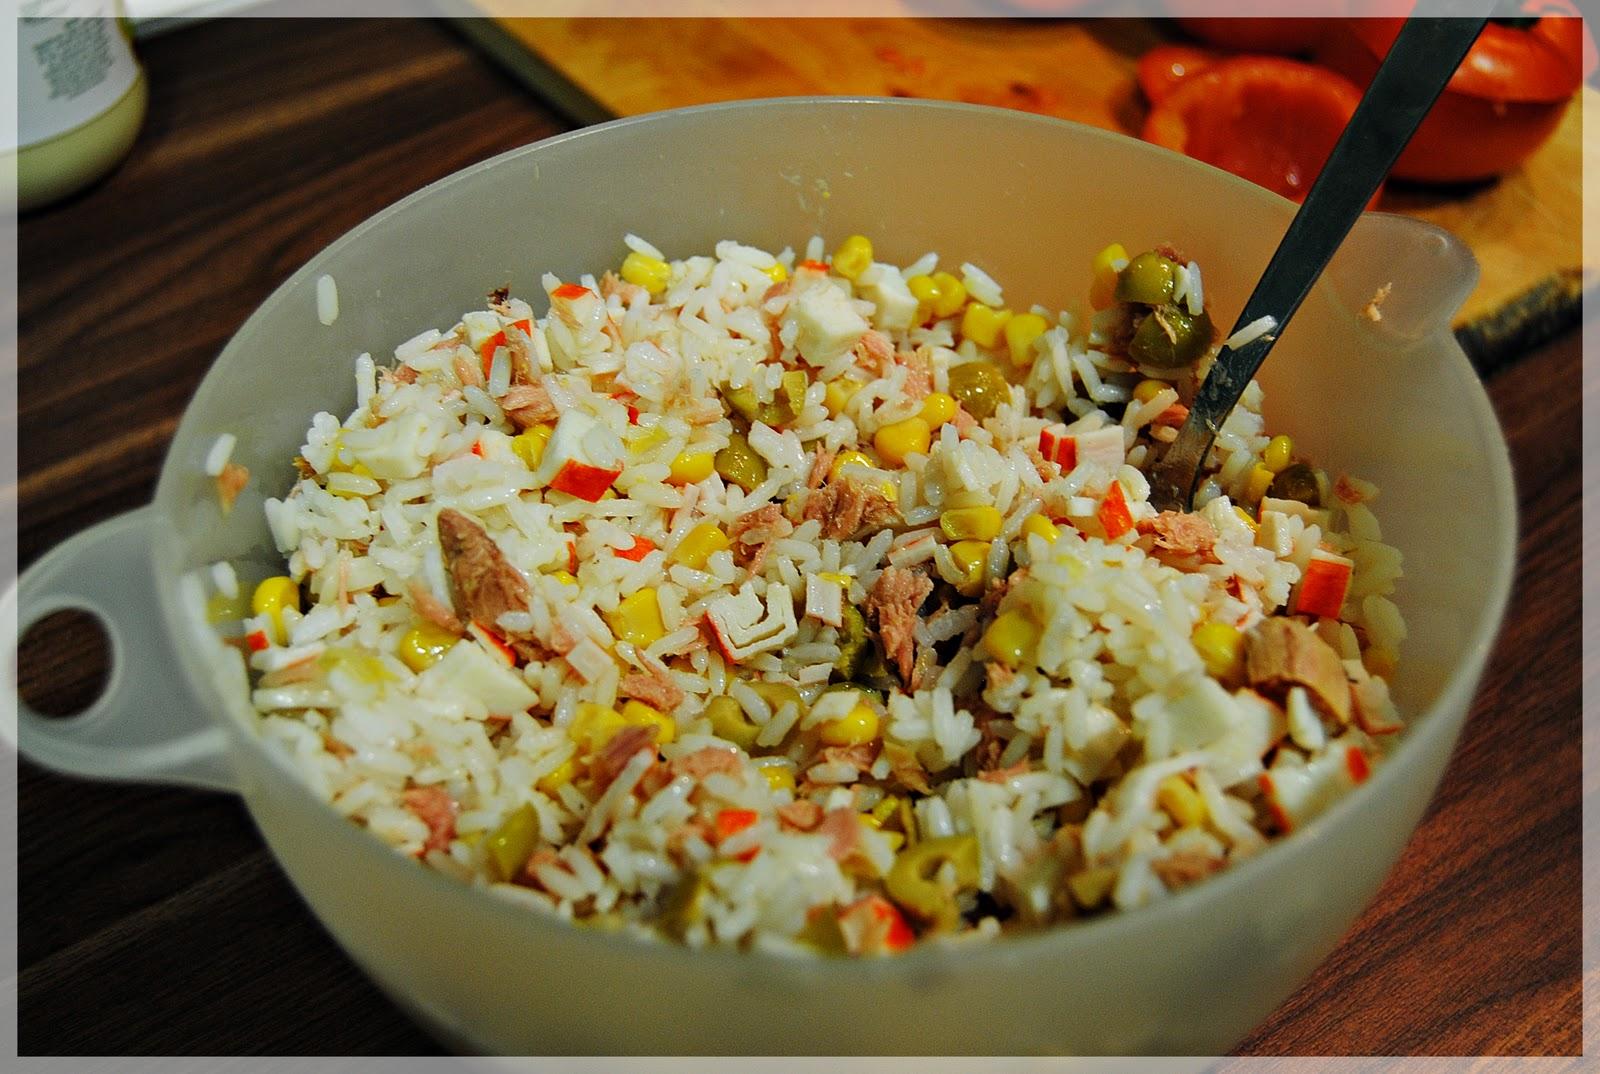 A comer cosas ricas tomates rellenos de ensalada de arroz - Ensalada de arroz y atun ...